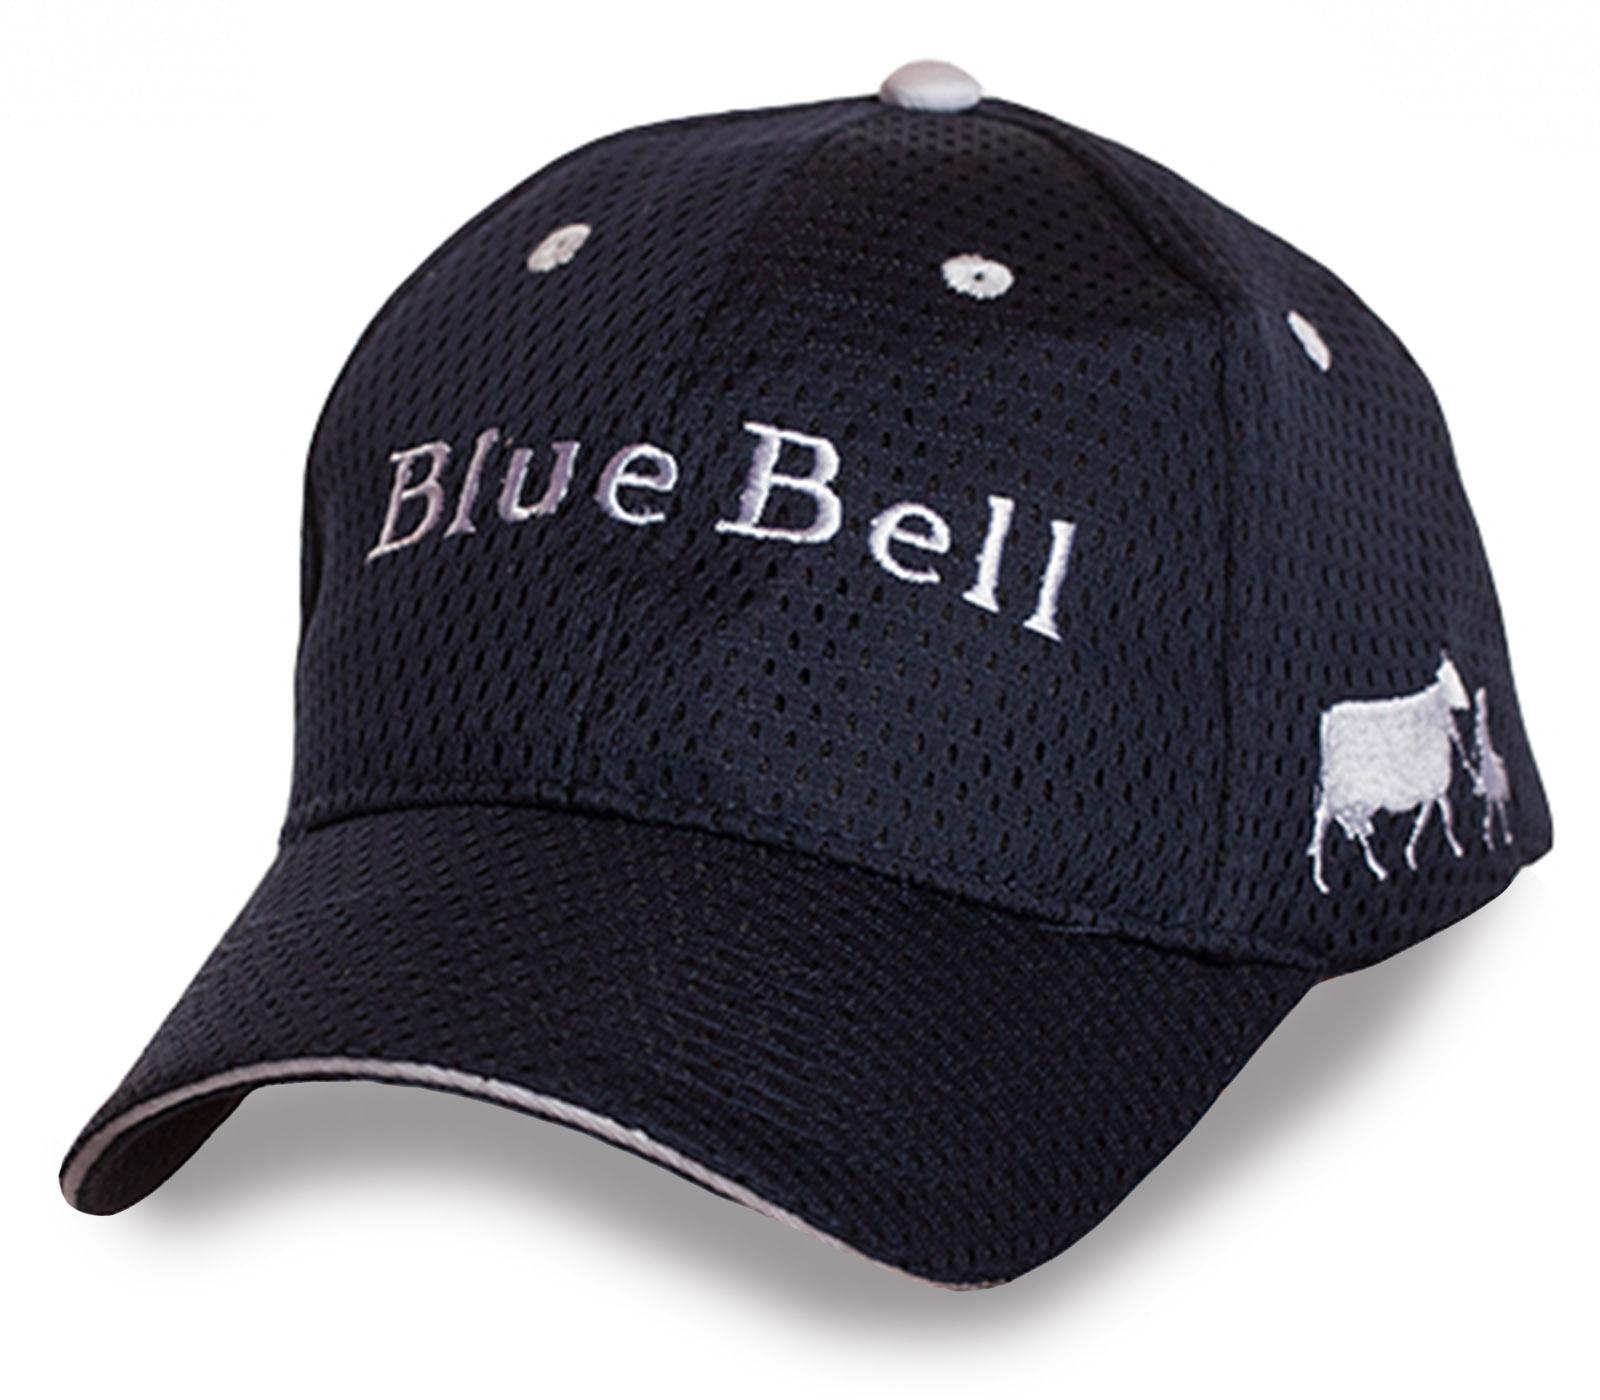 Хитовая бейсболка Blue Bell.